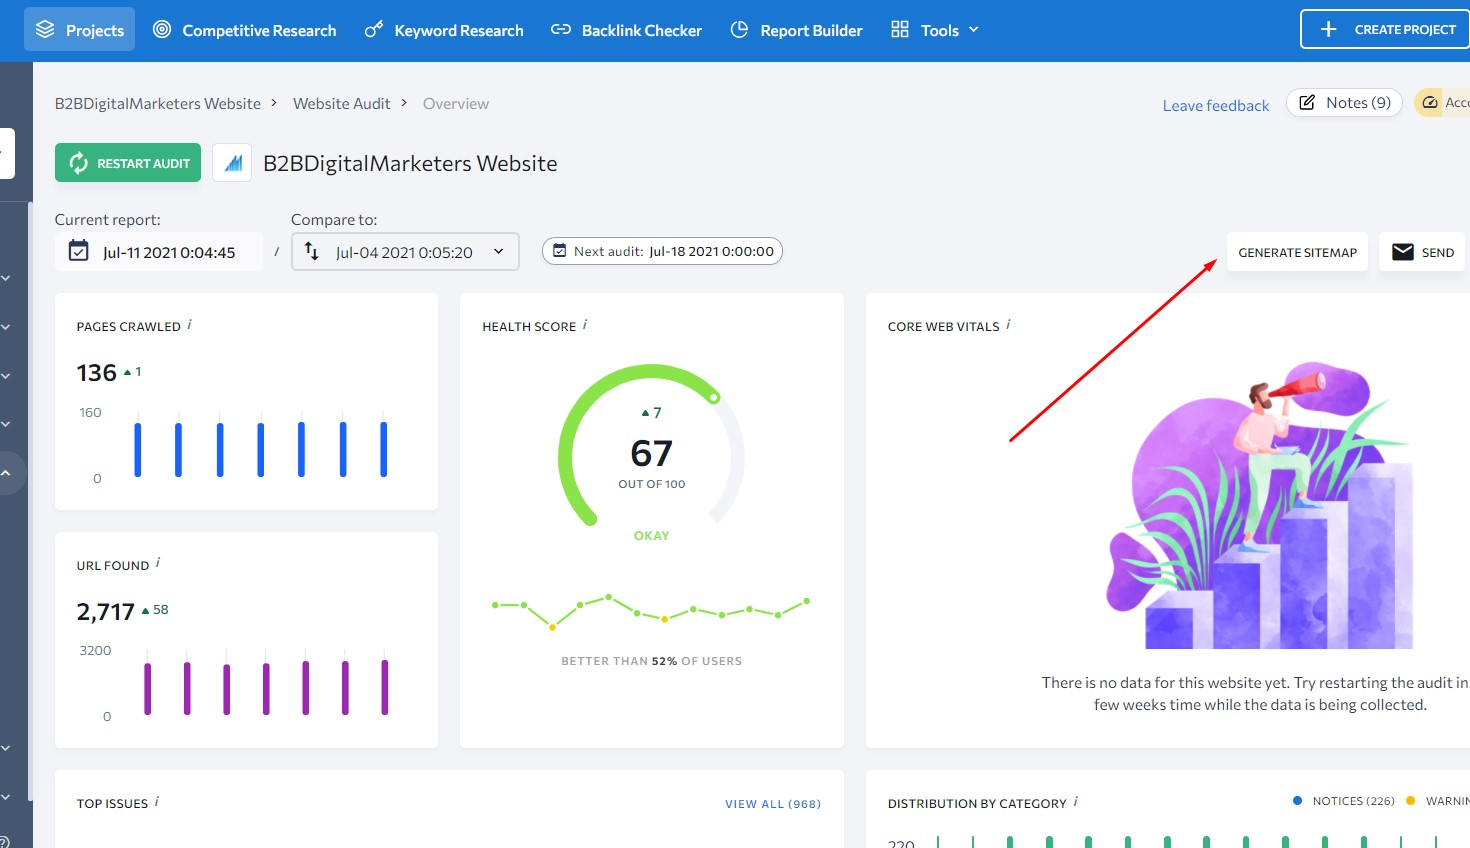 generate sitemap in se ranking